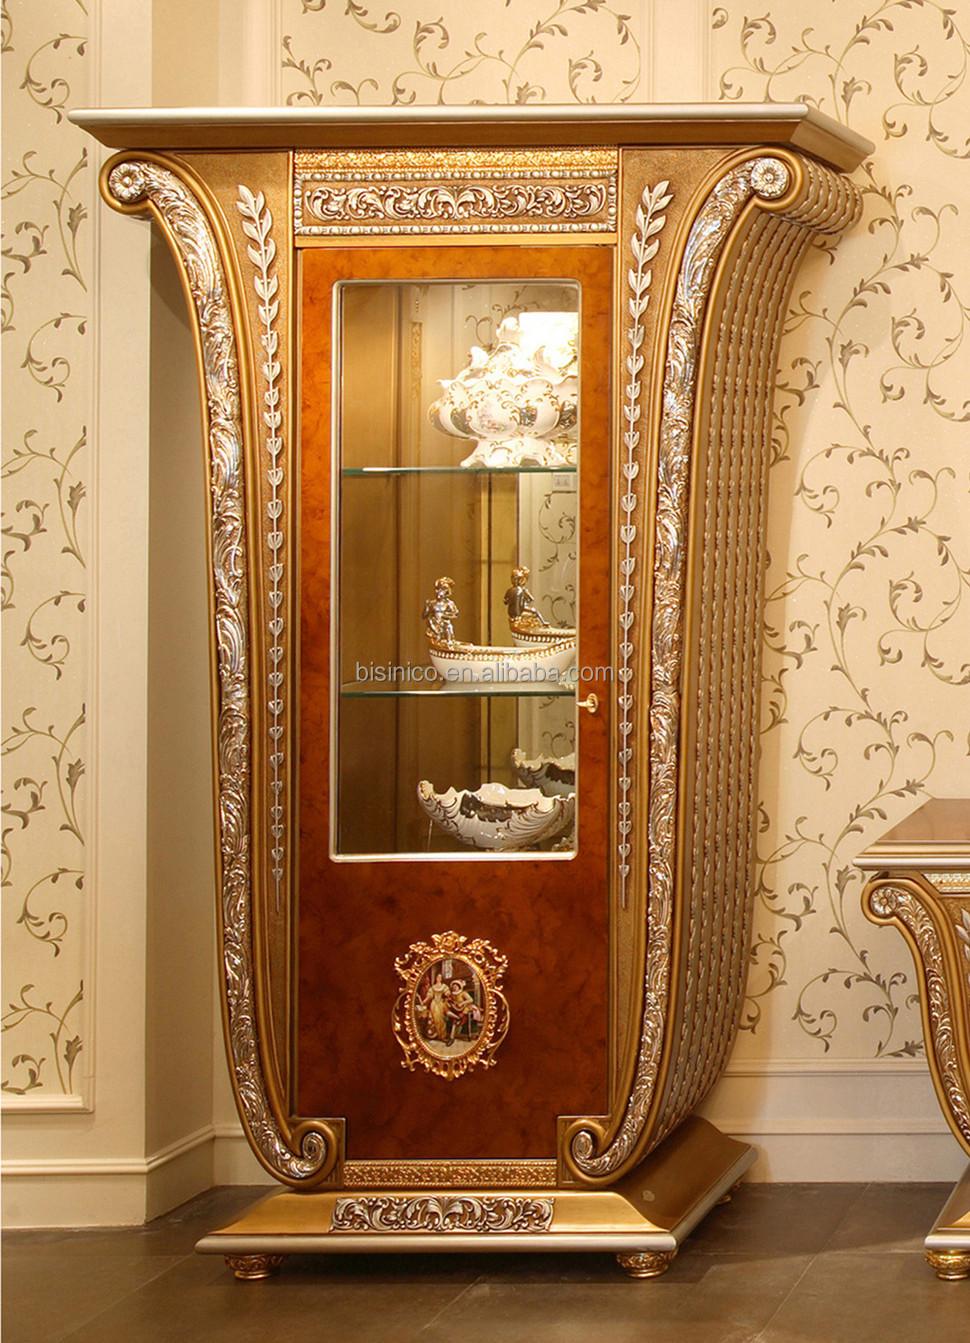 Koop laag geprijsde dutch set partijen groothandel dutch galerij afbeelding setop donker hout - Barokke stijl kamer ...